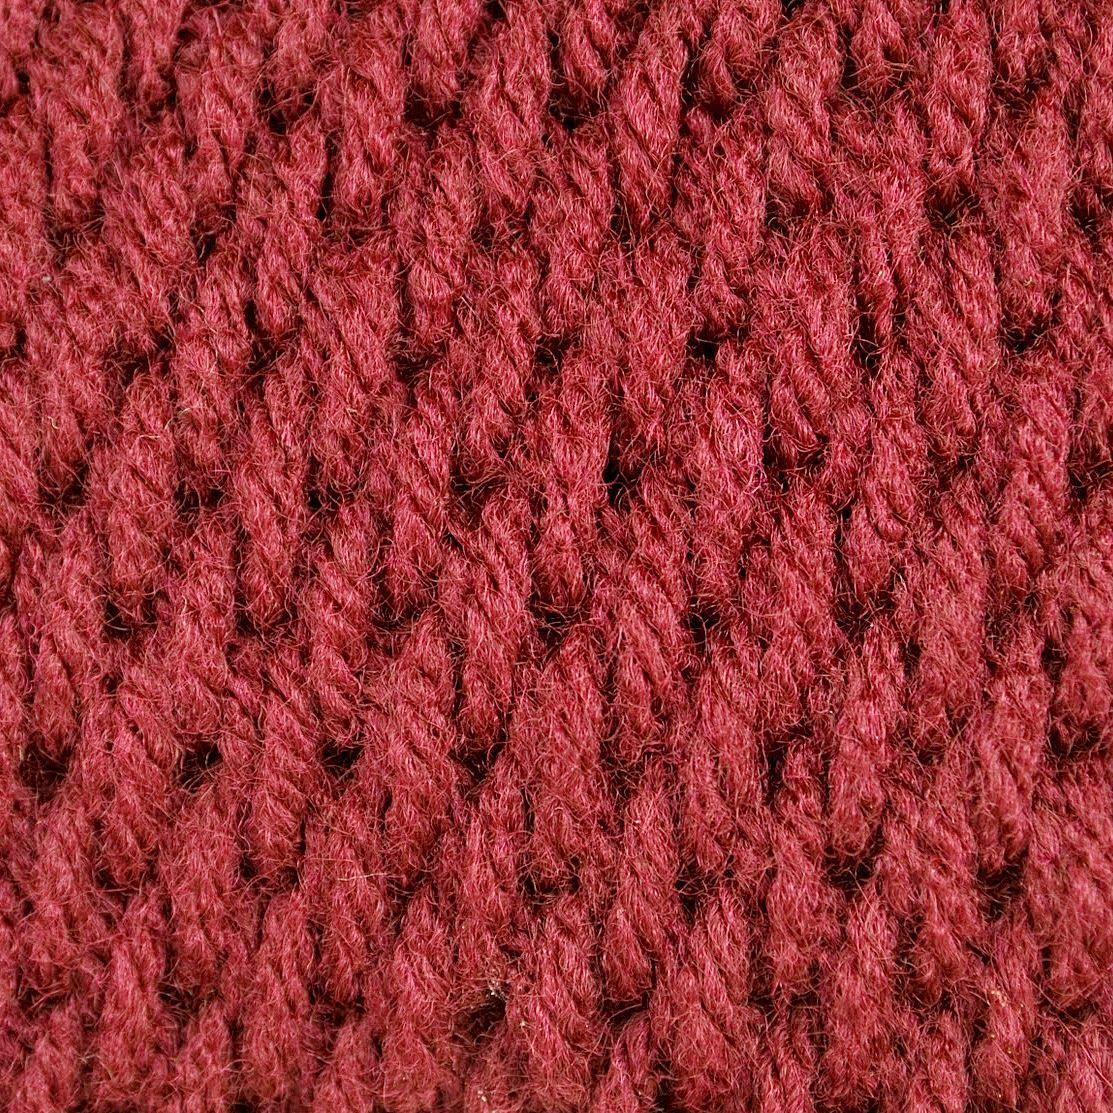 Tfs Tunisian Full Stitch from My Tunisian Crochet: Basic Stitches ...